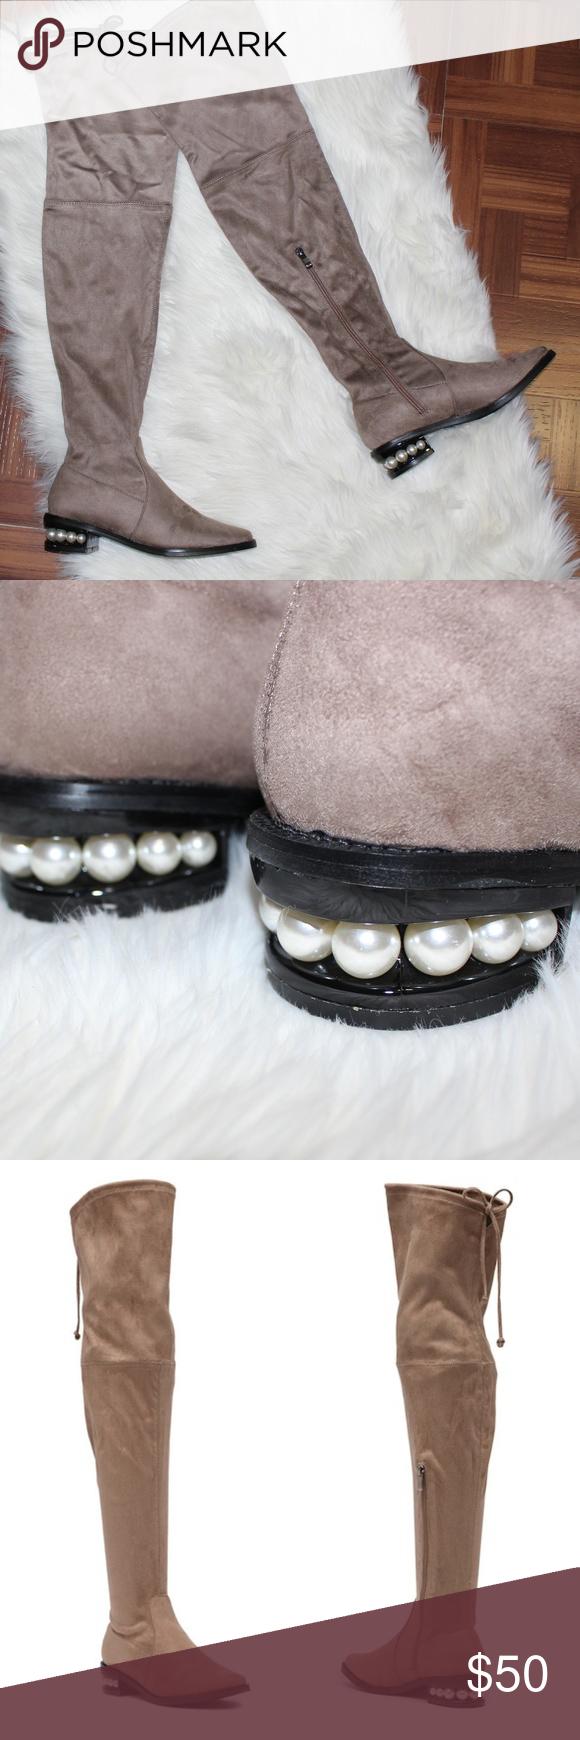 9a4a2fa306c BNIB Catherine Malandrino Taupe Over-the-Knee Boot Catherine Malandrino  Perse Embellished Over-